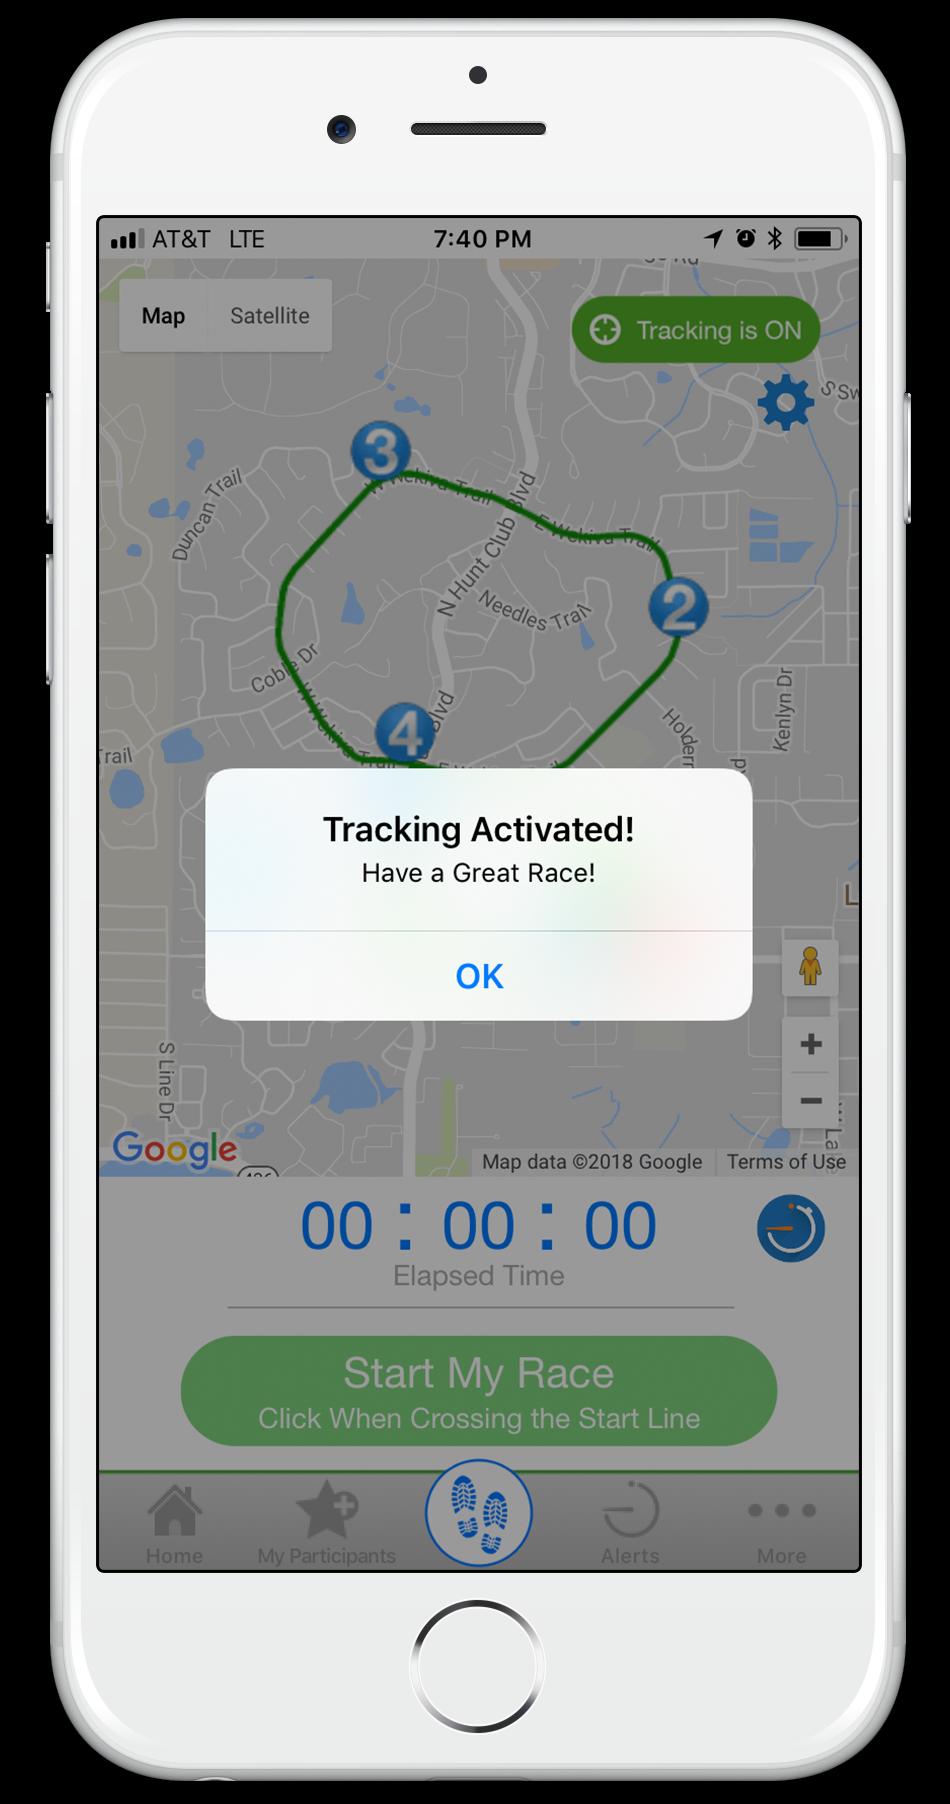 TrackingActivatedPhone.png